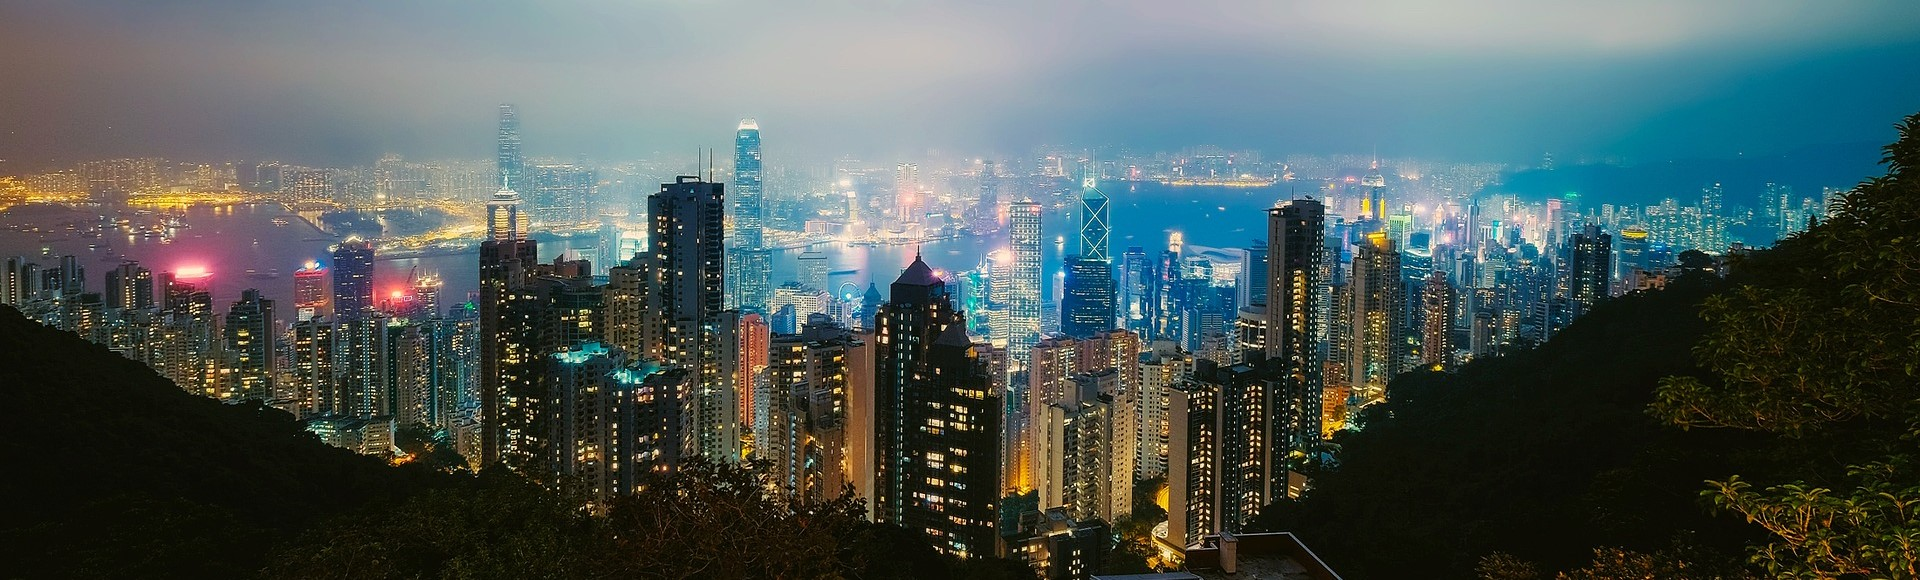 hong-kong-1990267_1920